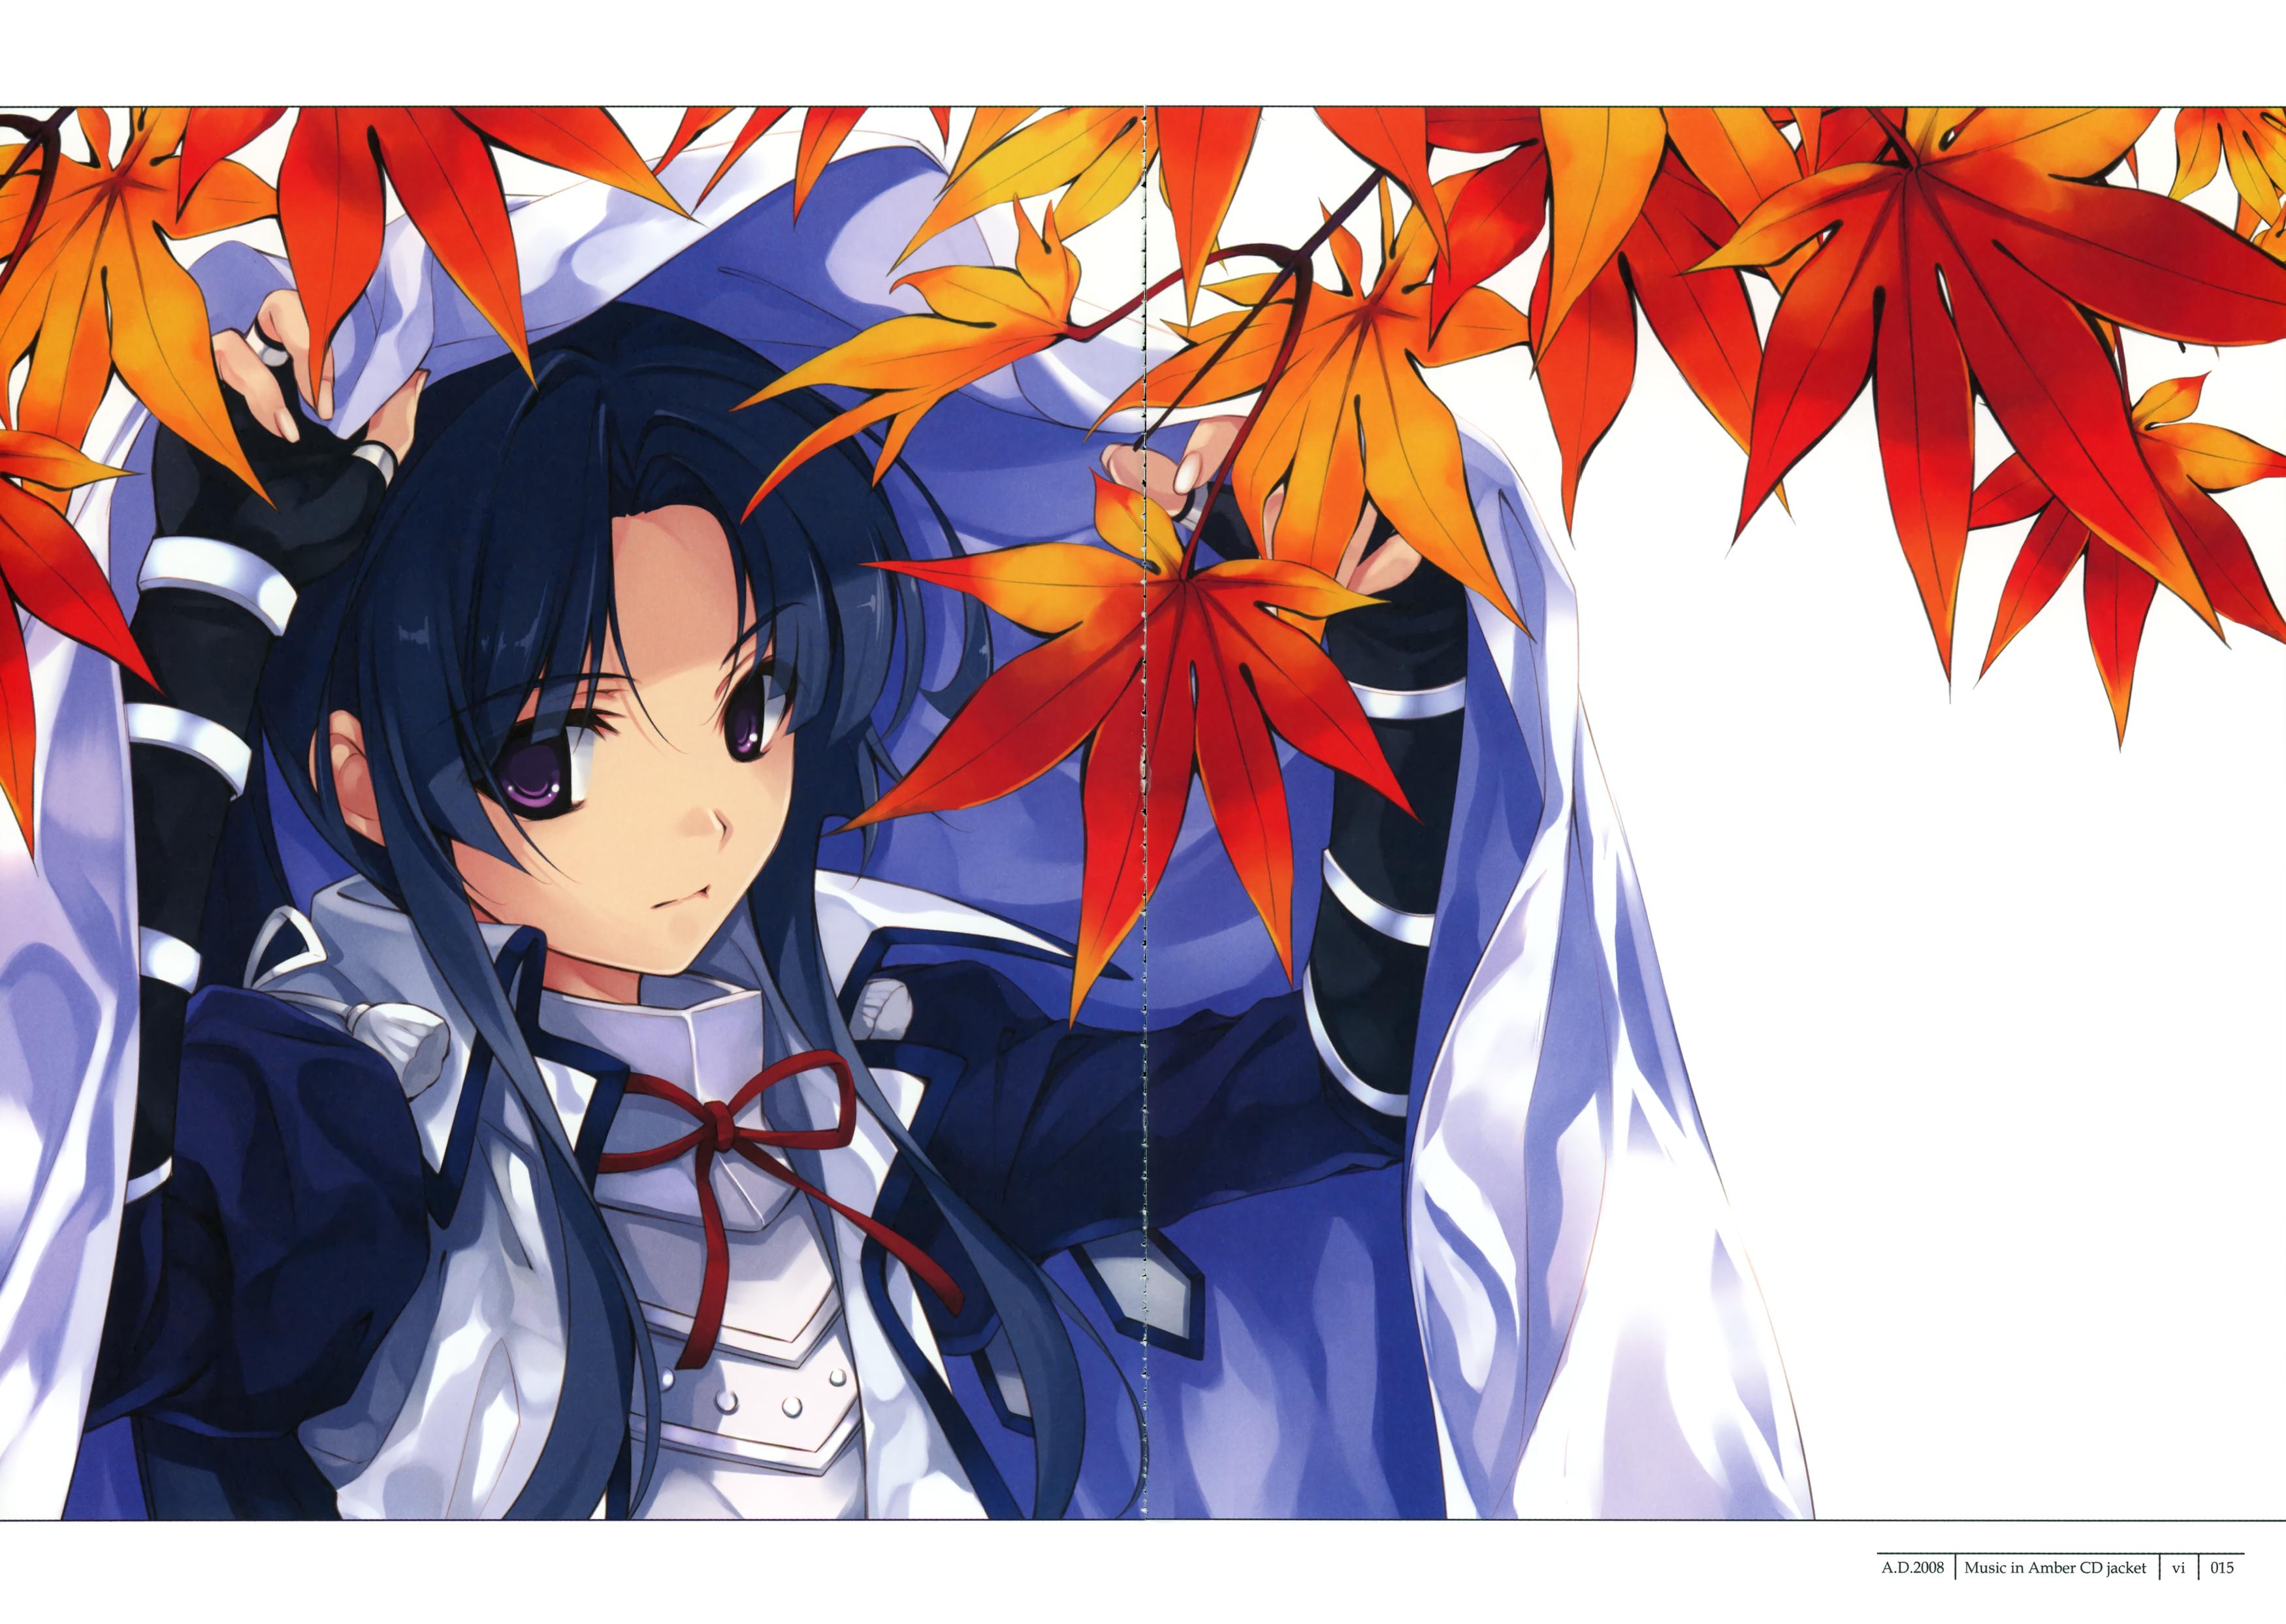 Uesugi Kenshin (Sengoku Rance) - Rance Series - Image